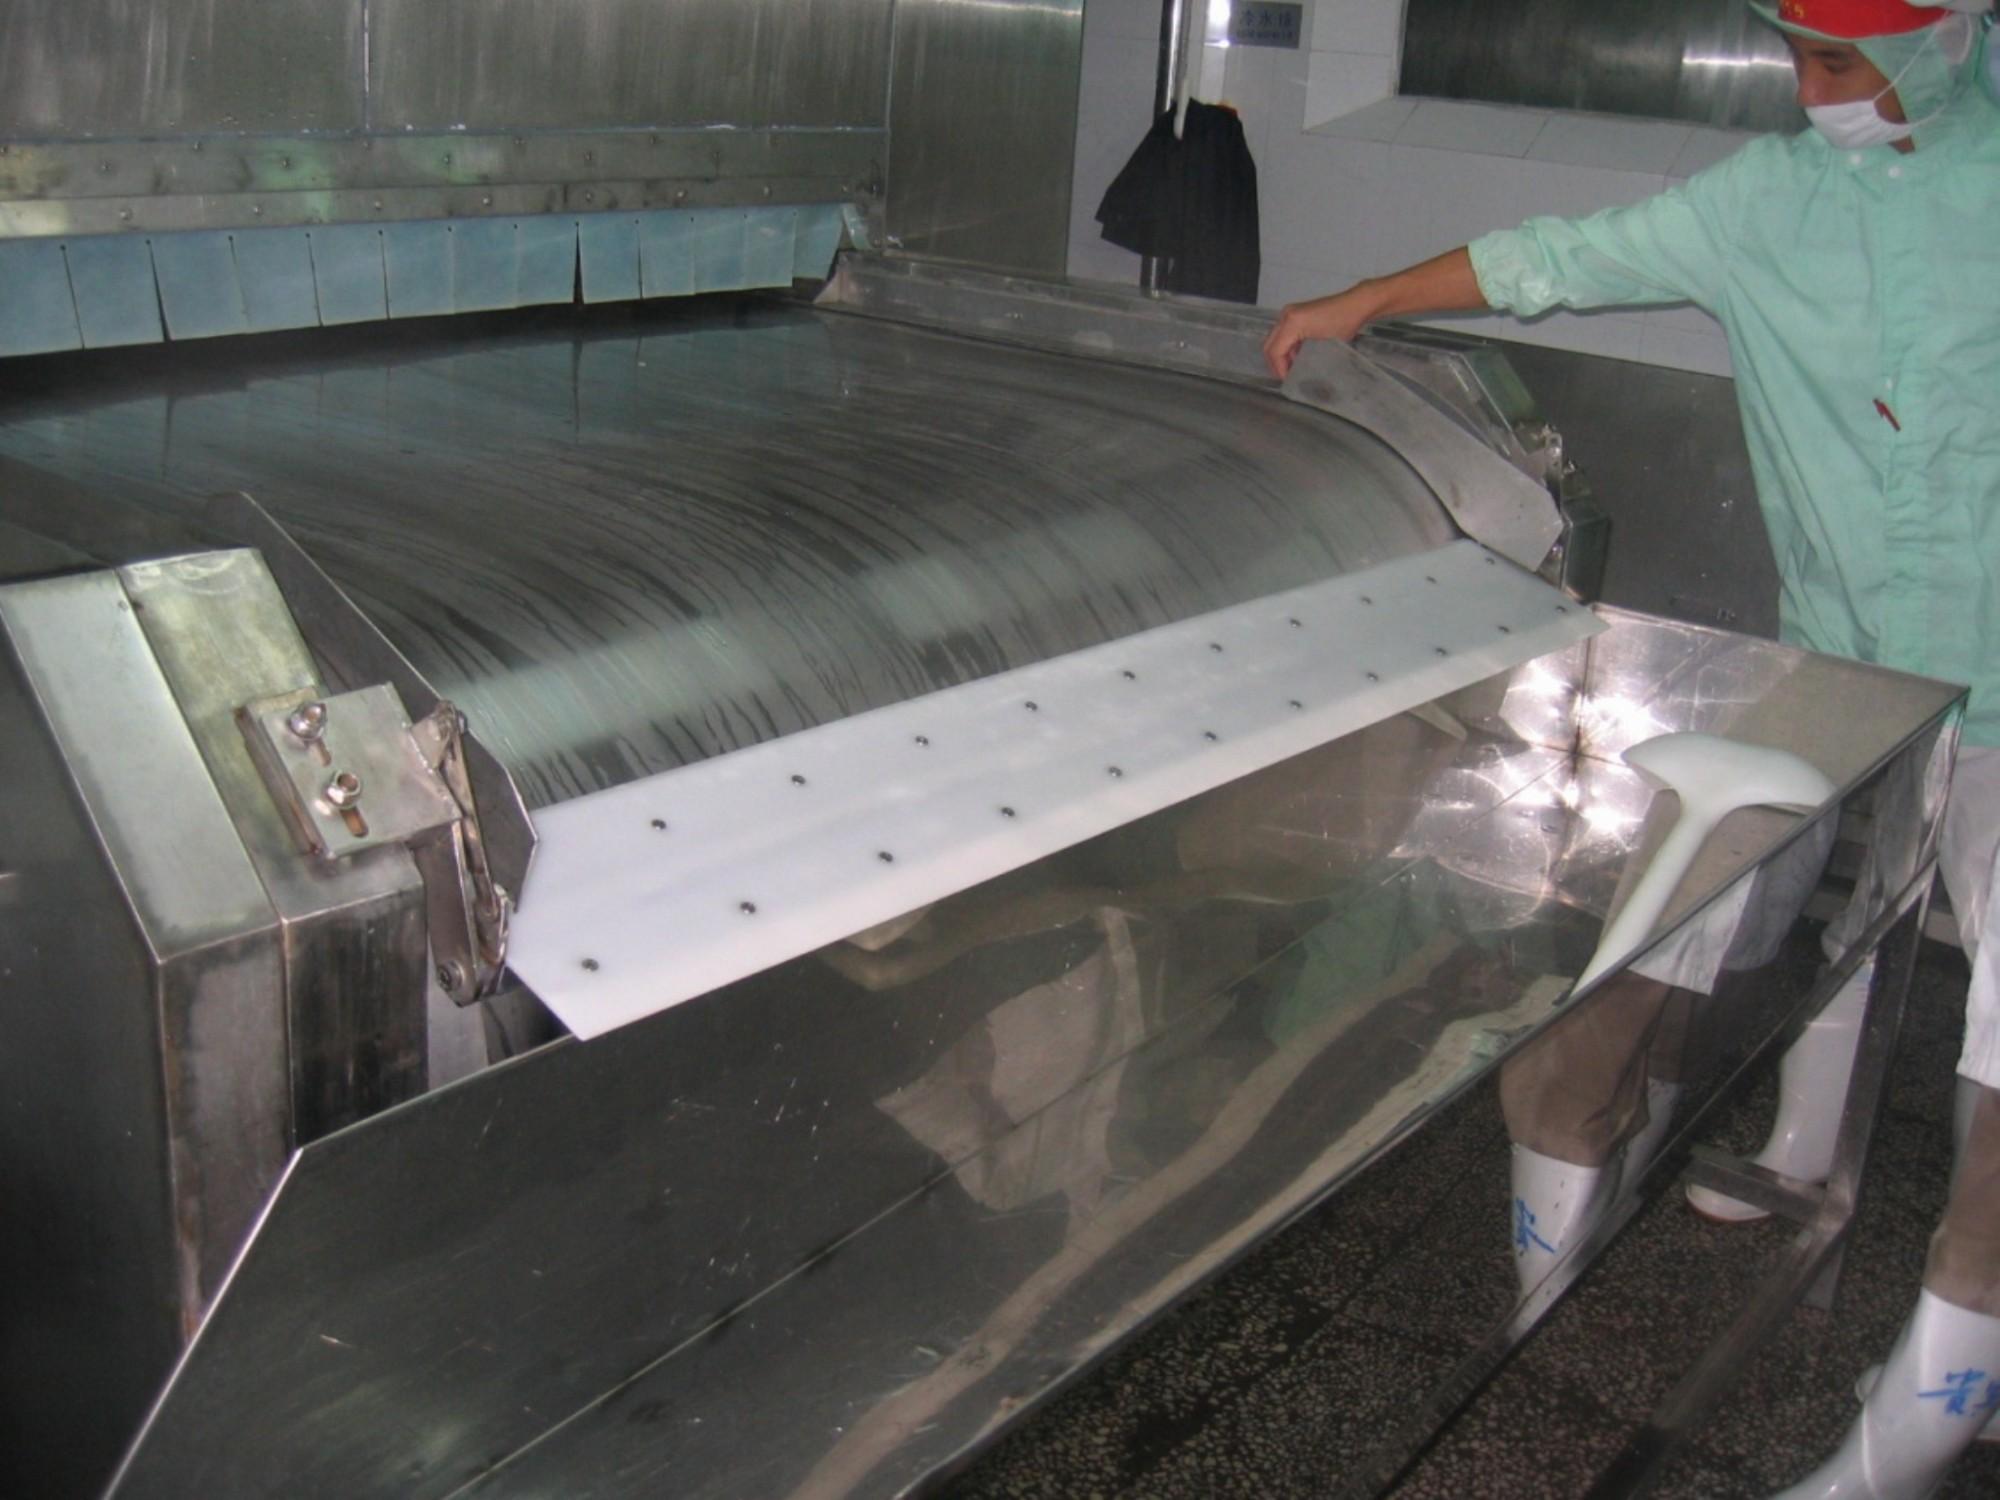 Good Price Mesh Belt Tunnel Freezer For Fish Fillet Manufacturers, Good Price Mesh Belt Tunnel Freezer For Fish Fillet Factory, Supply Good Price Mesh Belt Tunnel Freezer For Fish Fillet